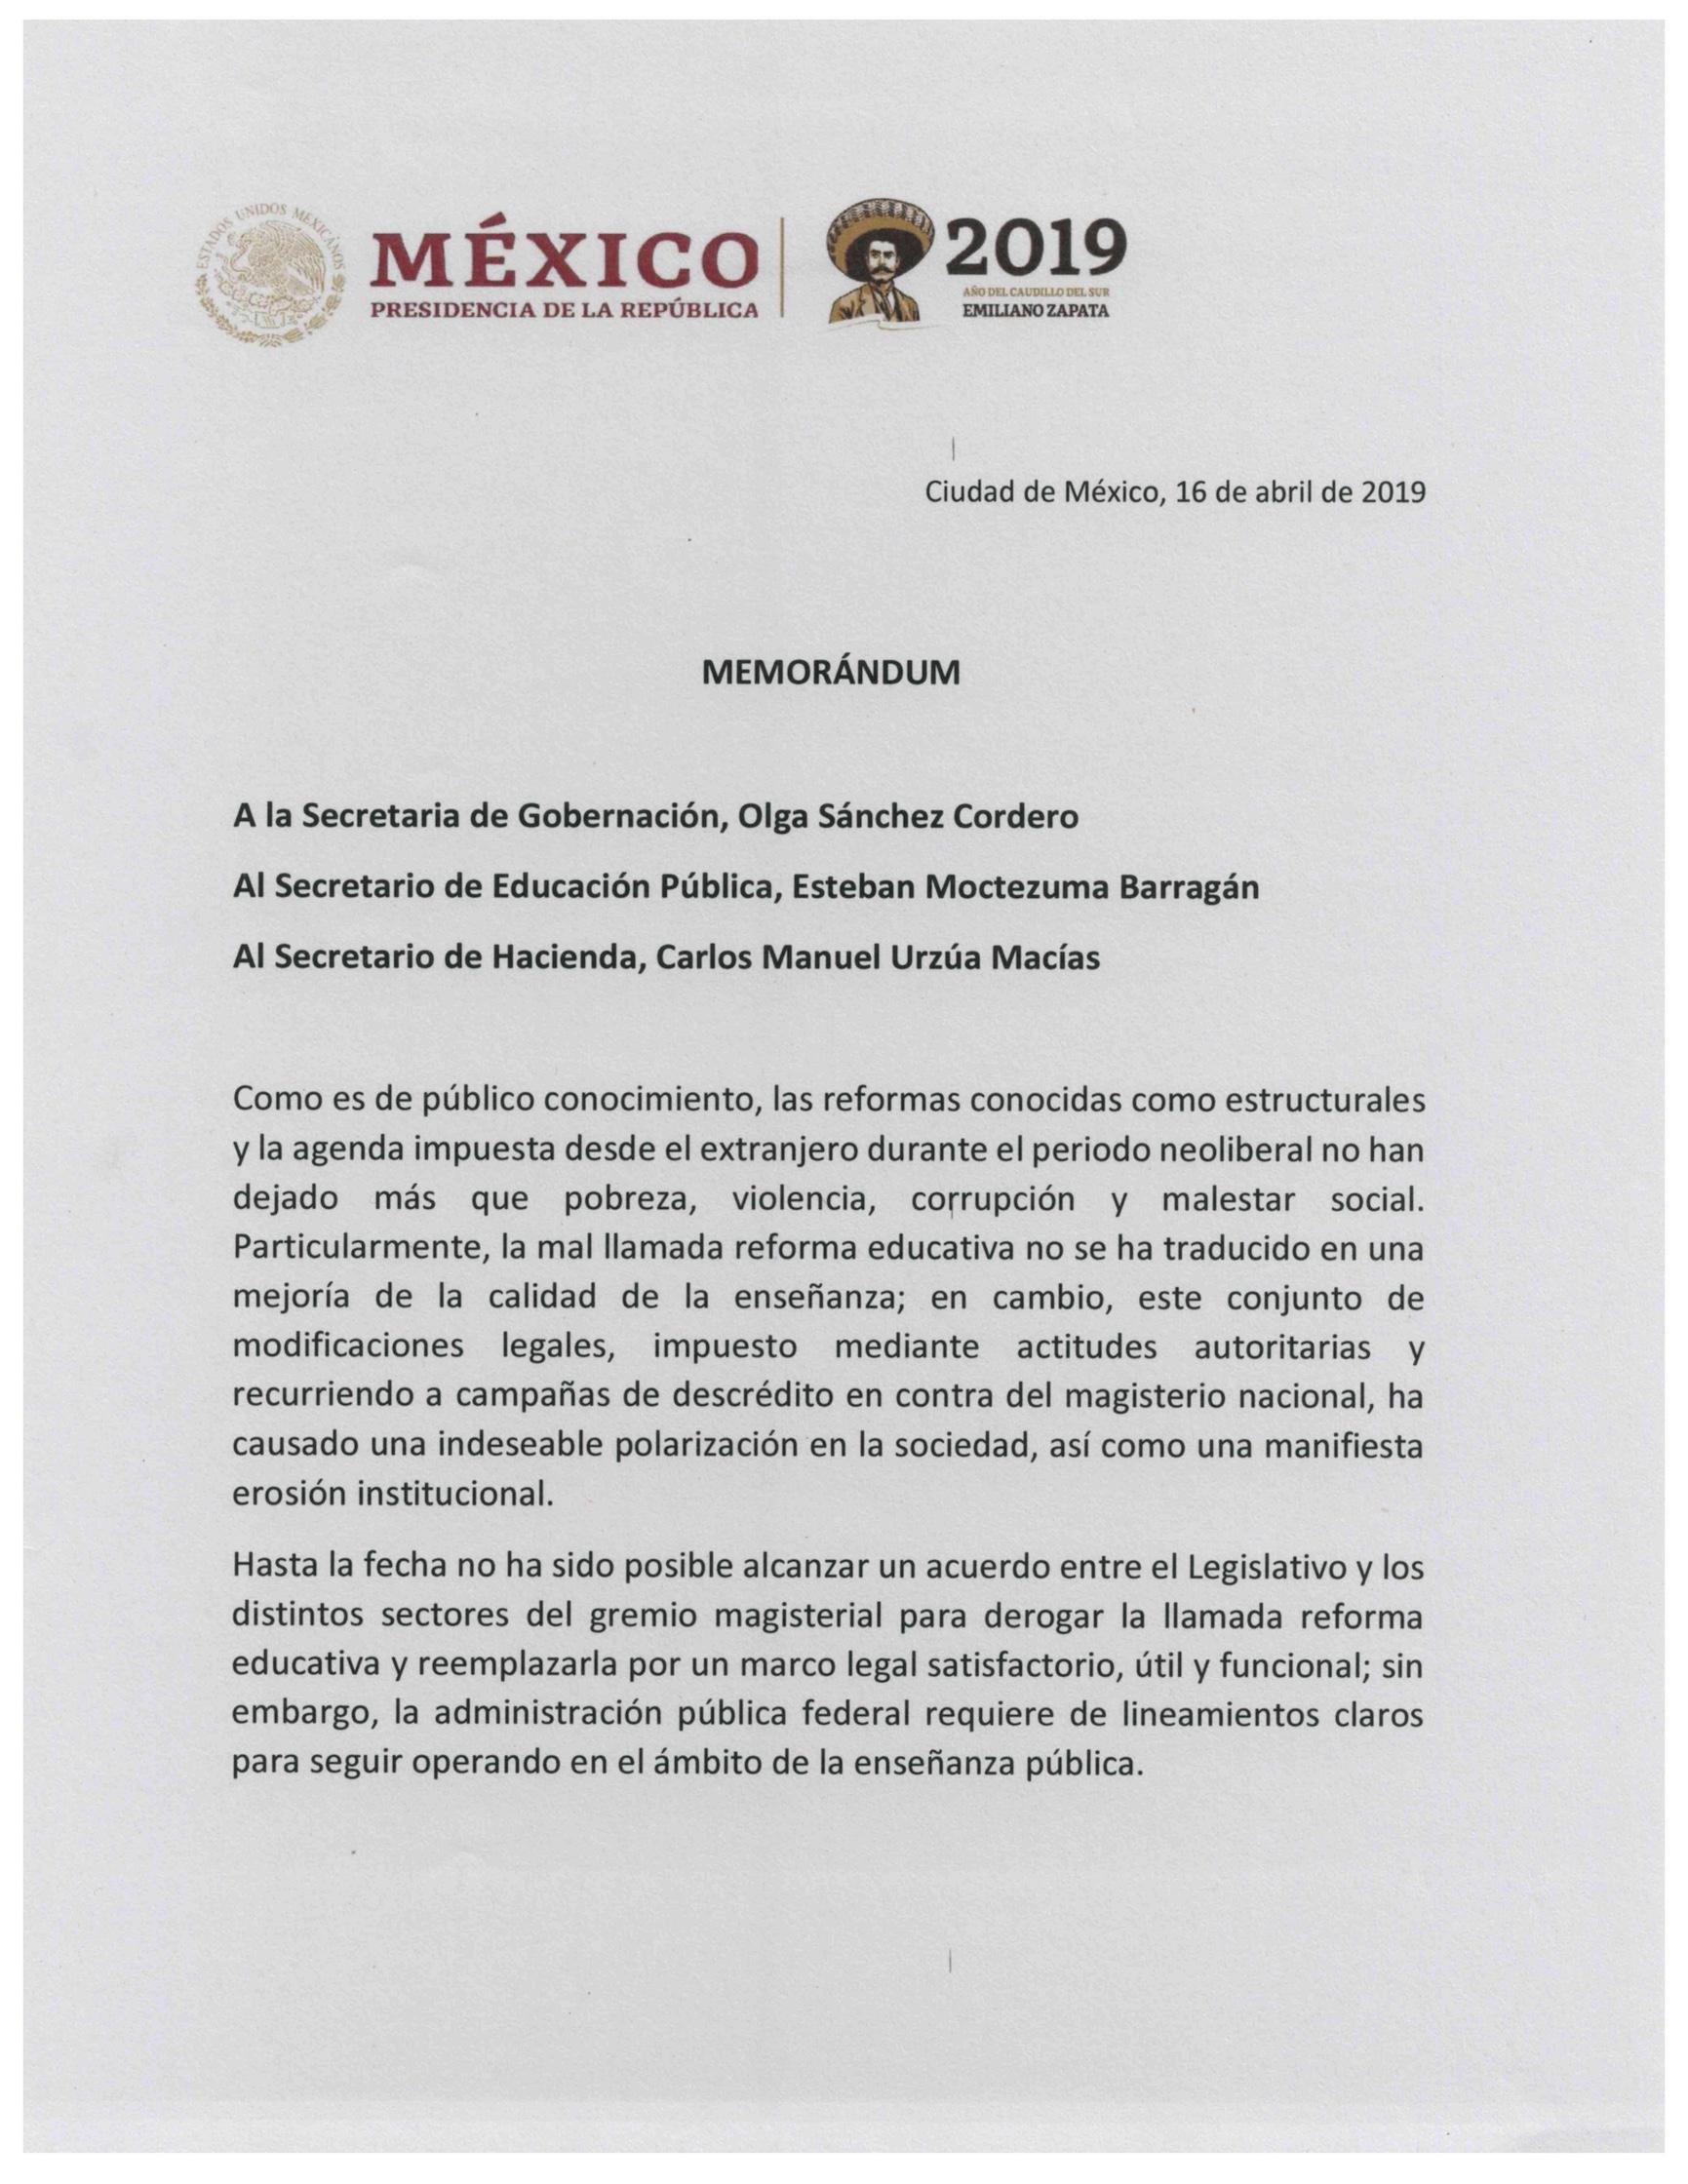 memo-amlo-reforma-educativa-2019-primera-hoja